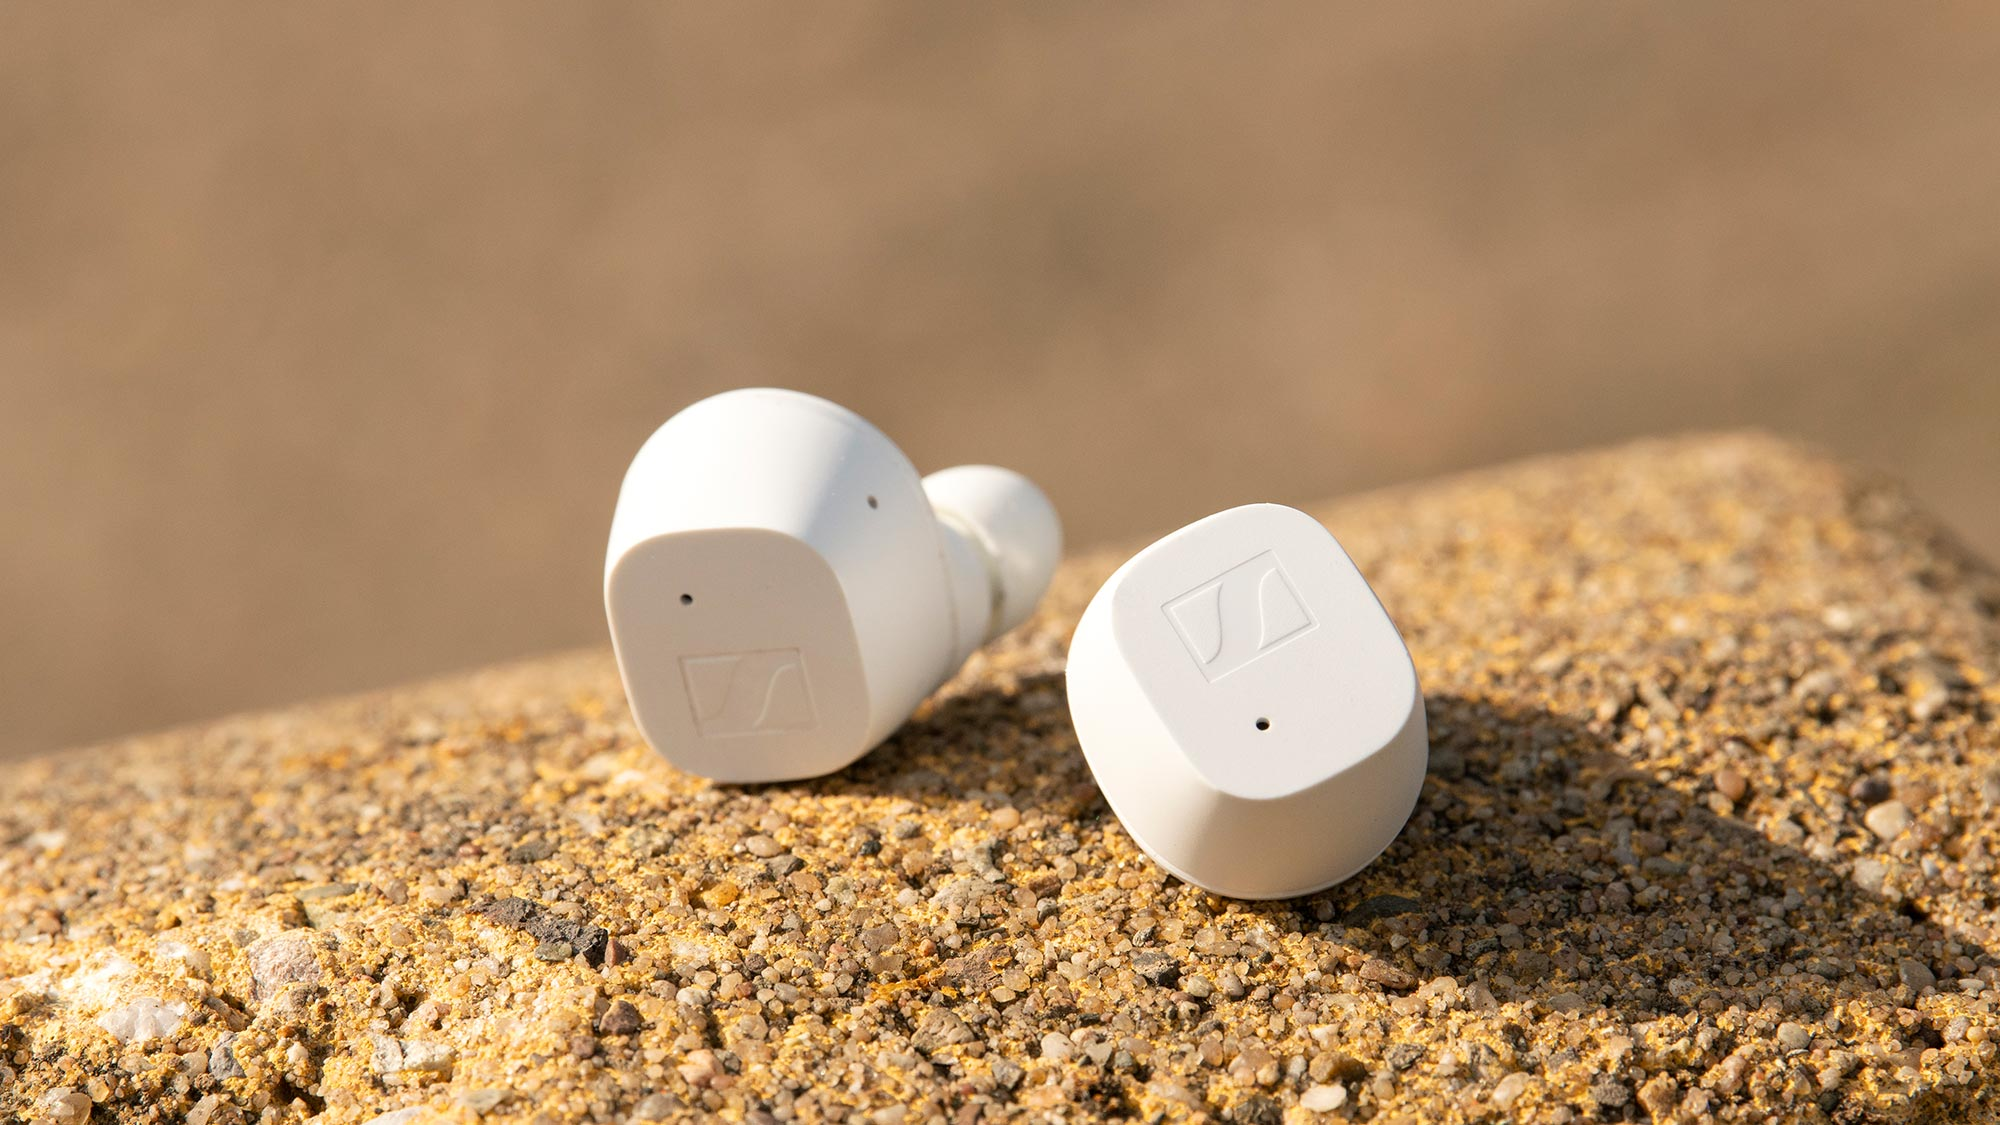 Sennheiser CX True Wireless Earbuds Revealed